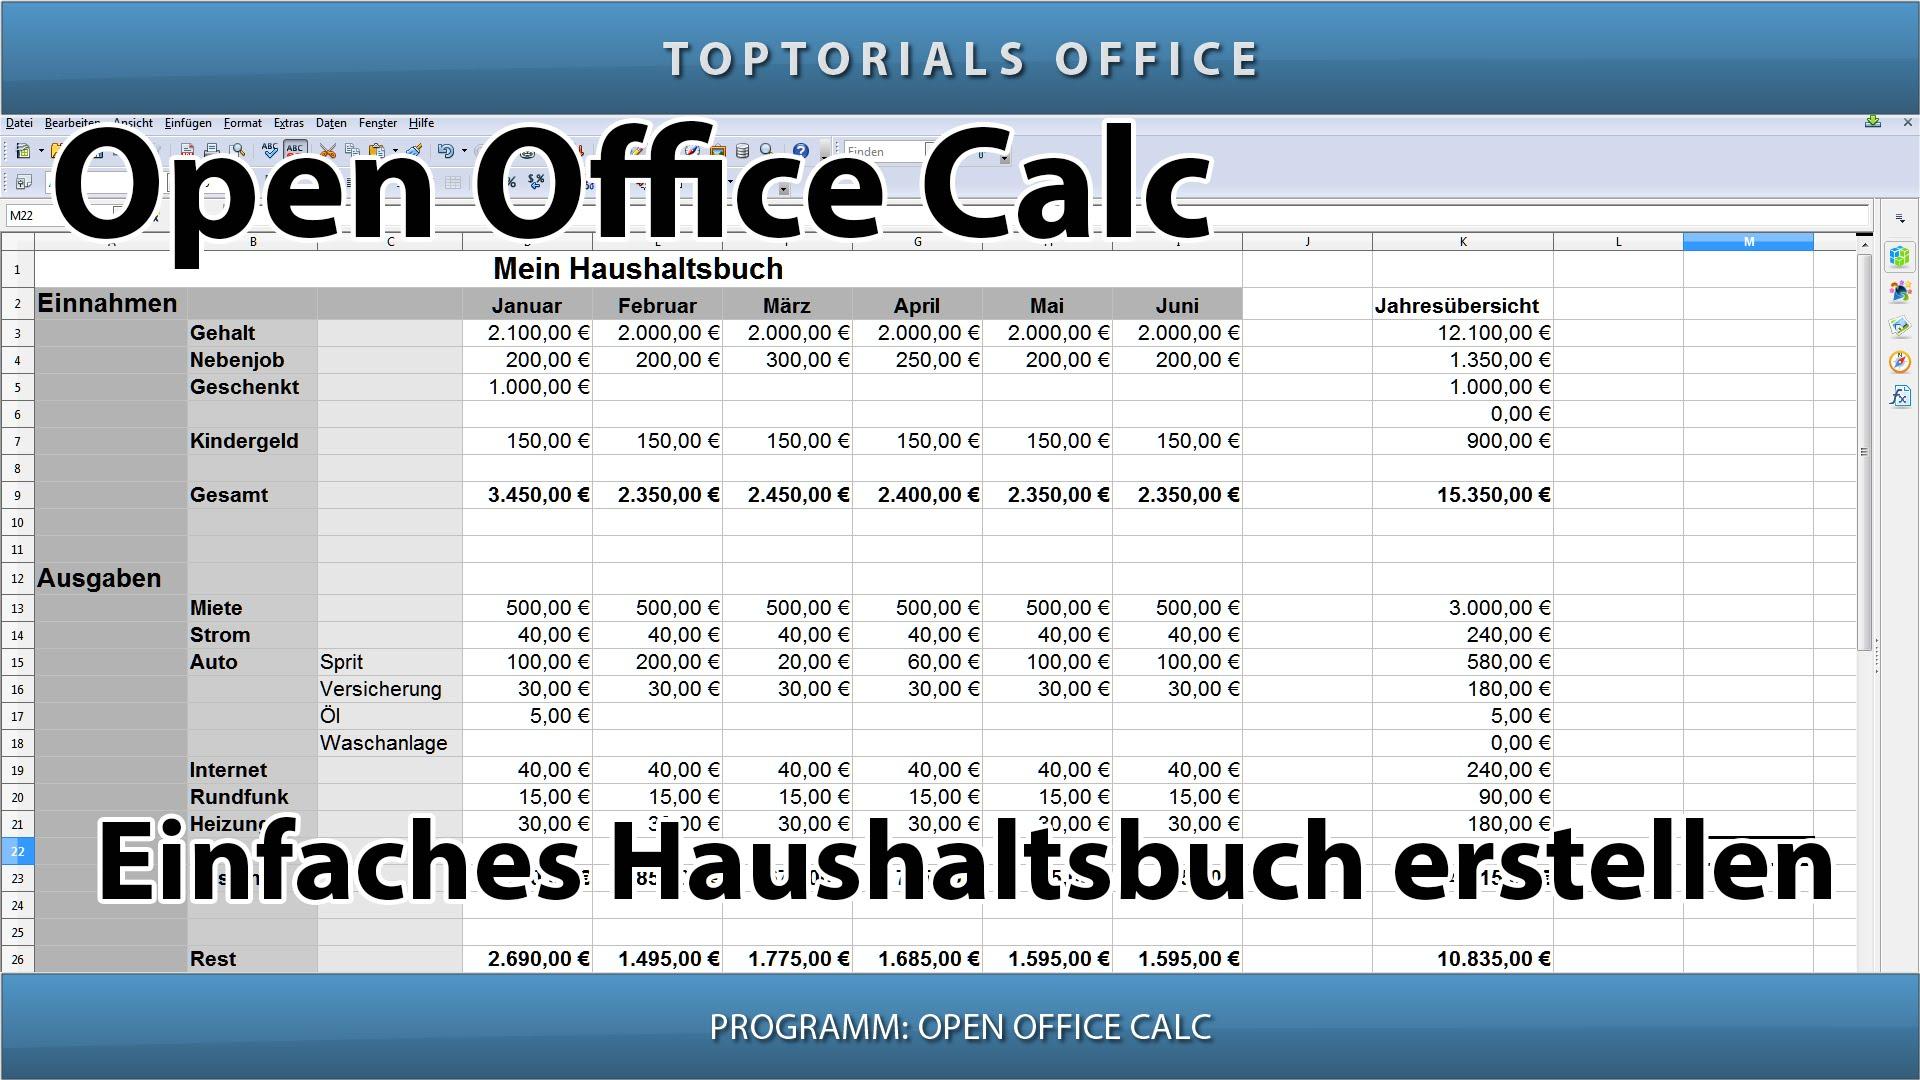 Einfaches haushaltsbuch erstellen openoffice calc for Tabelle open office